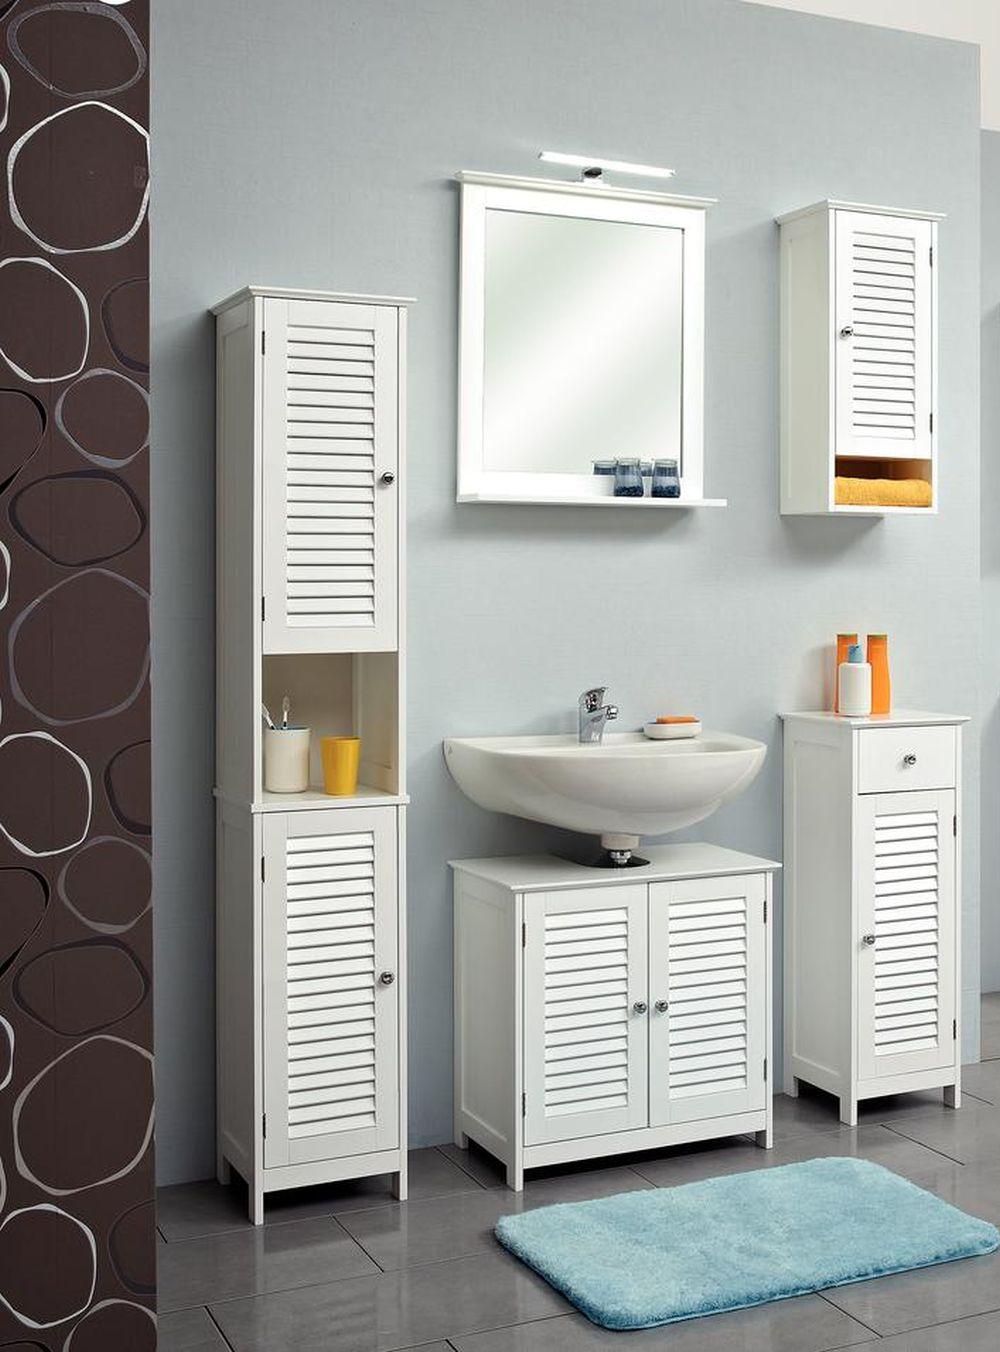 adelaparvu.com despre cum iti alegi mobila in baie, Foto Kika, model mobila Jasper